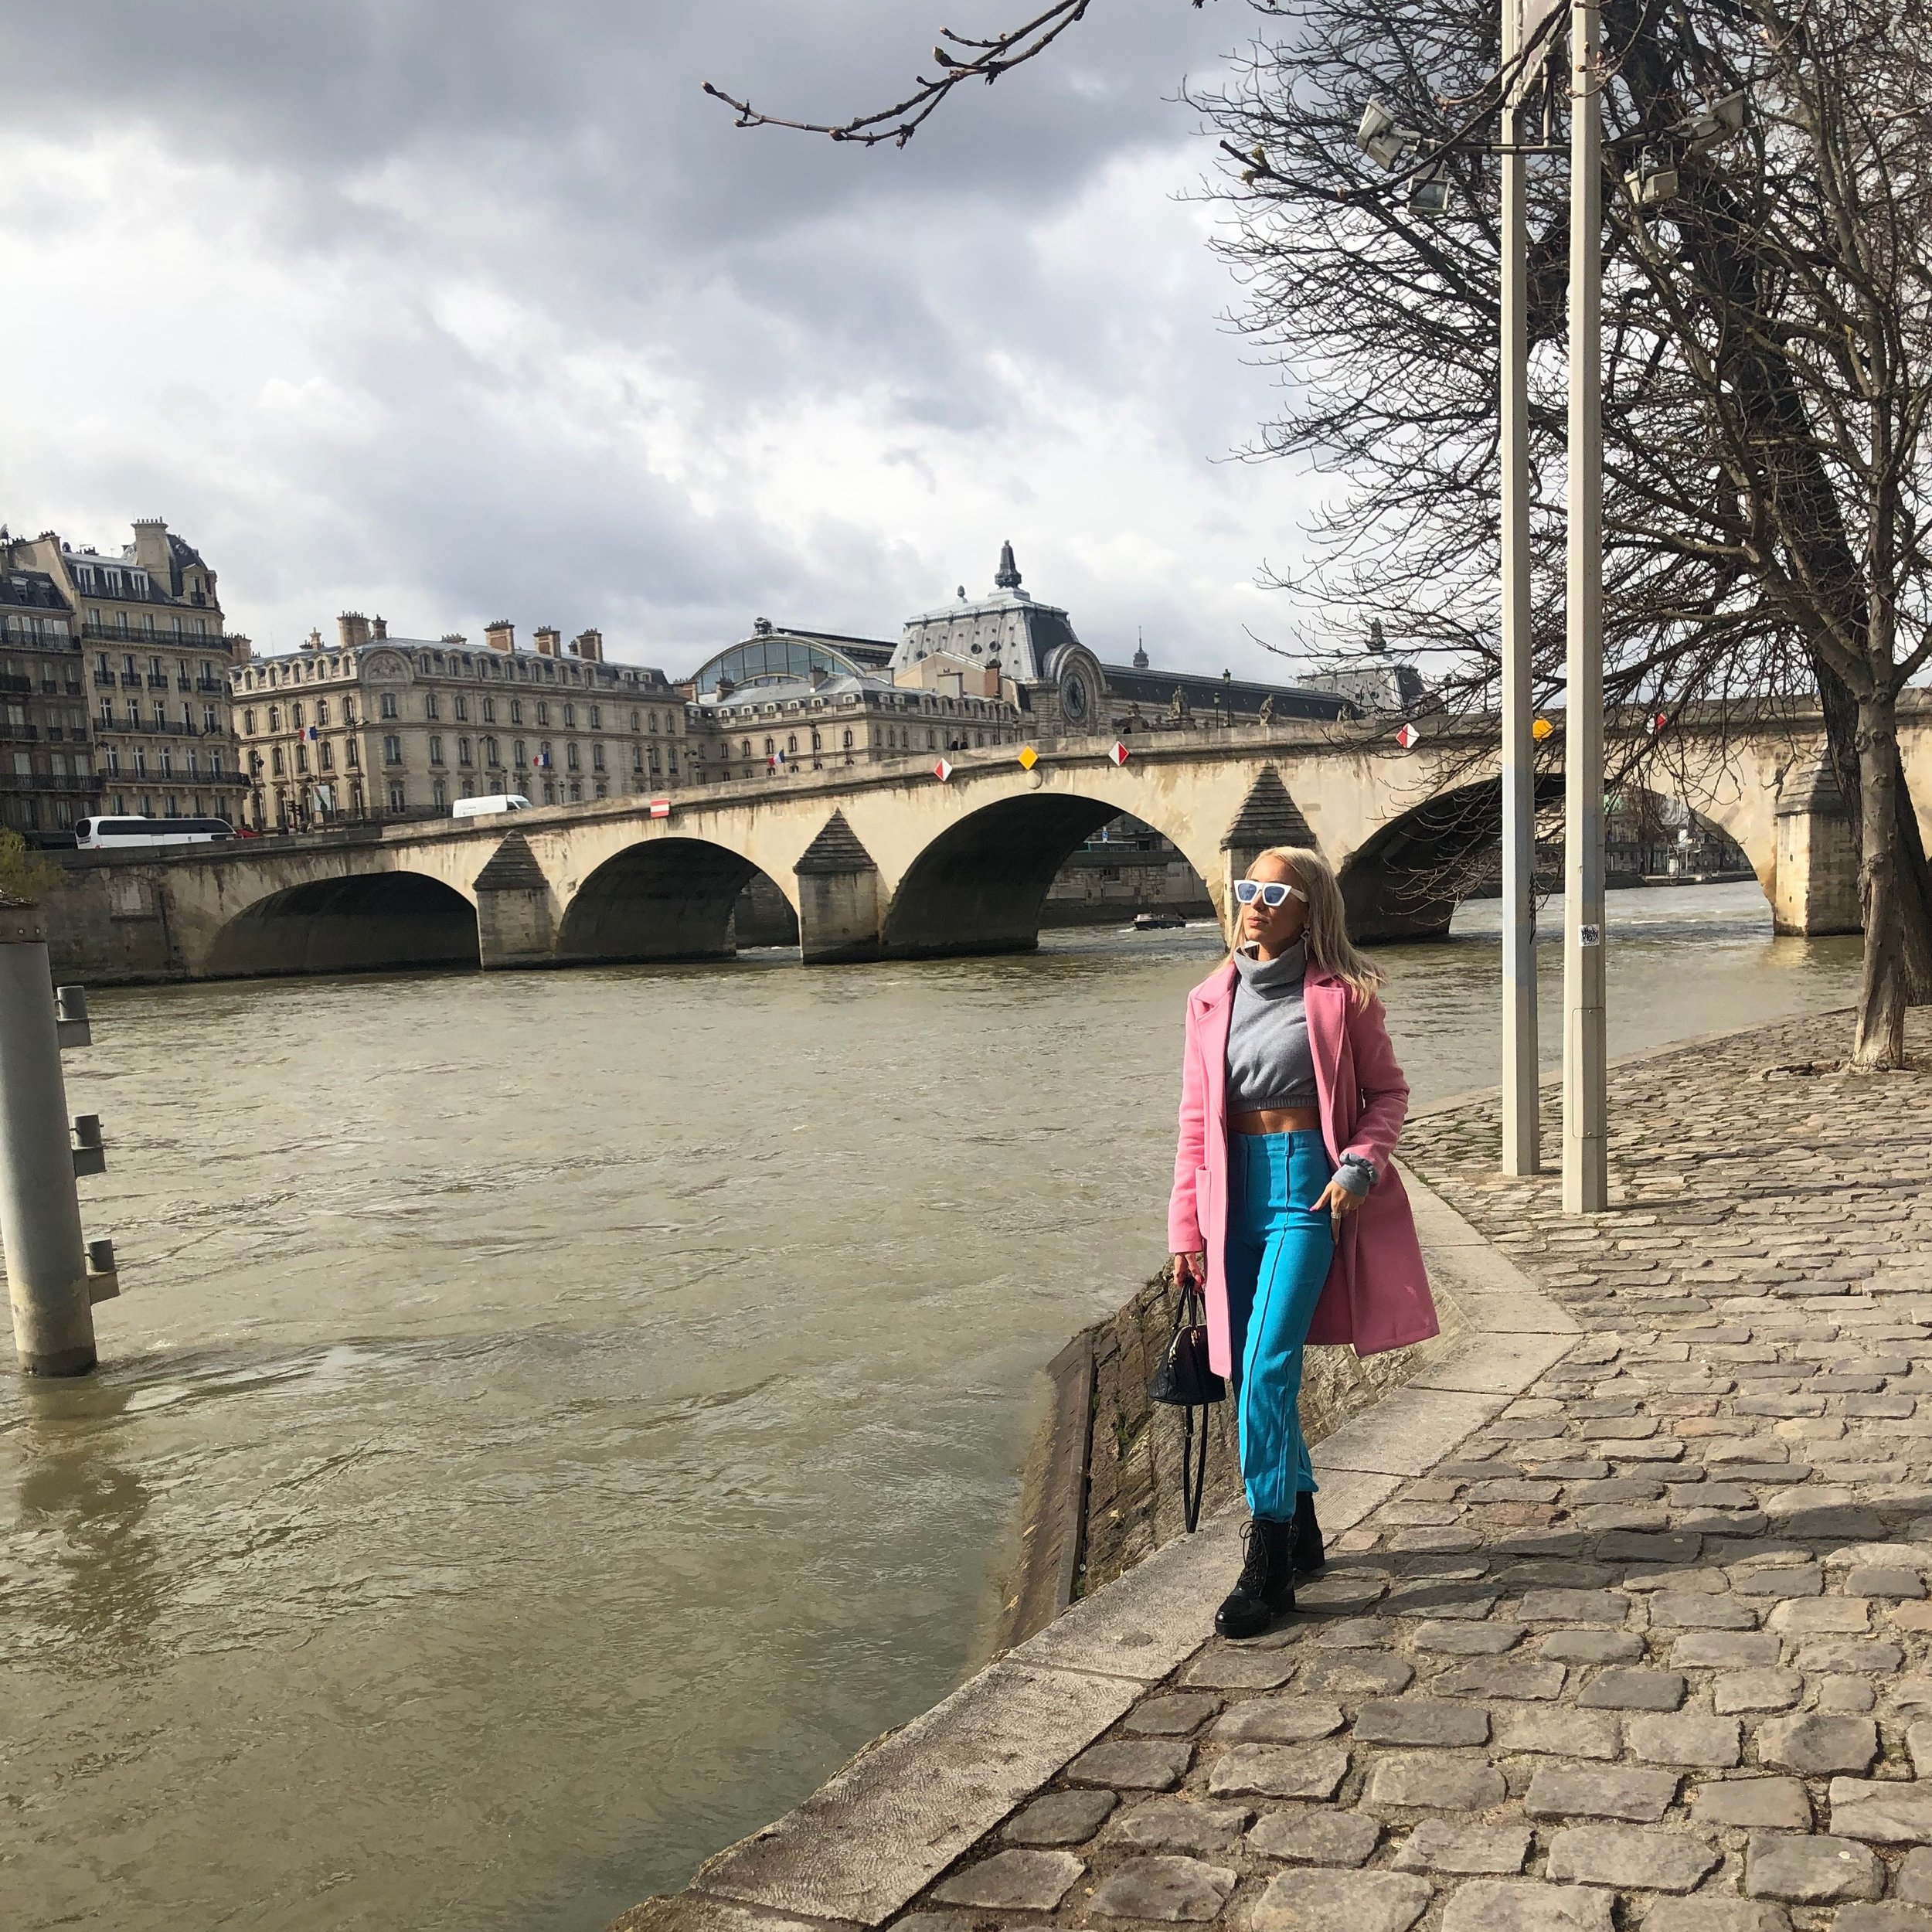 On the Seine River